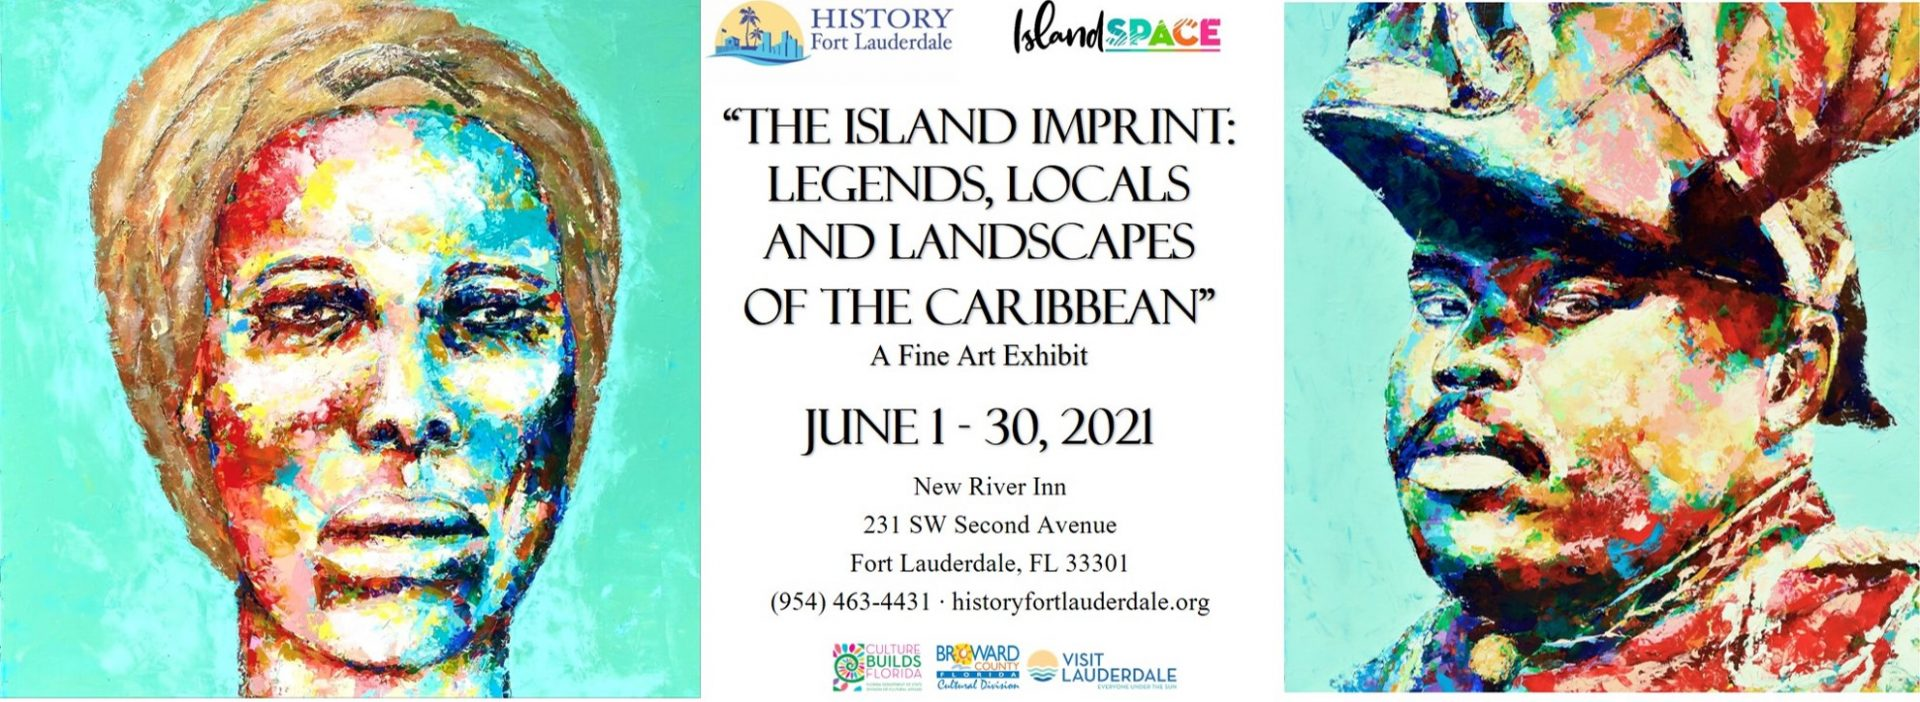 """The Island Imprint: Legends, Locals and Landsca..."